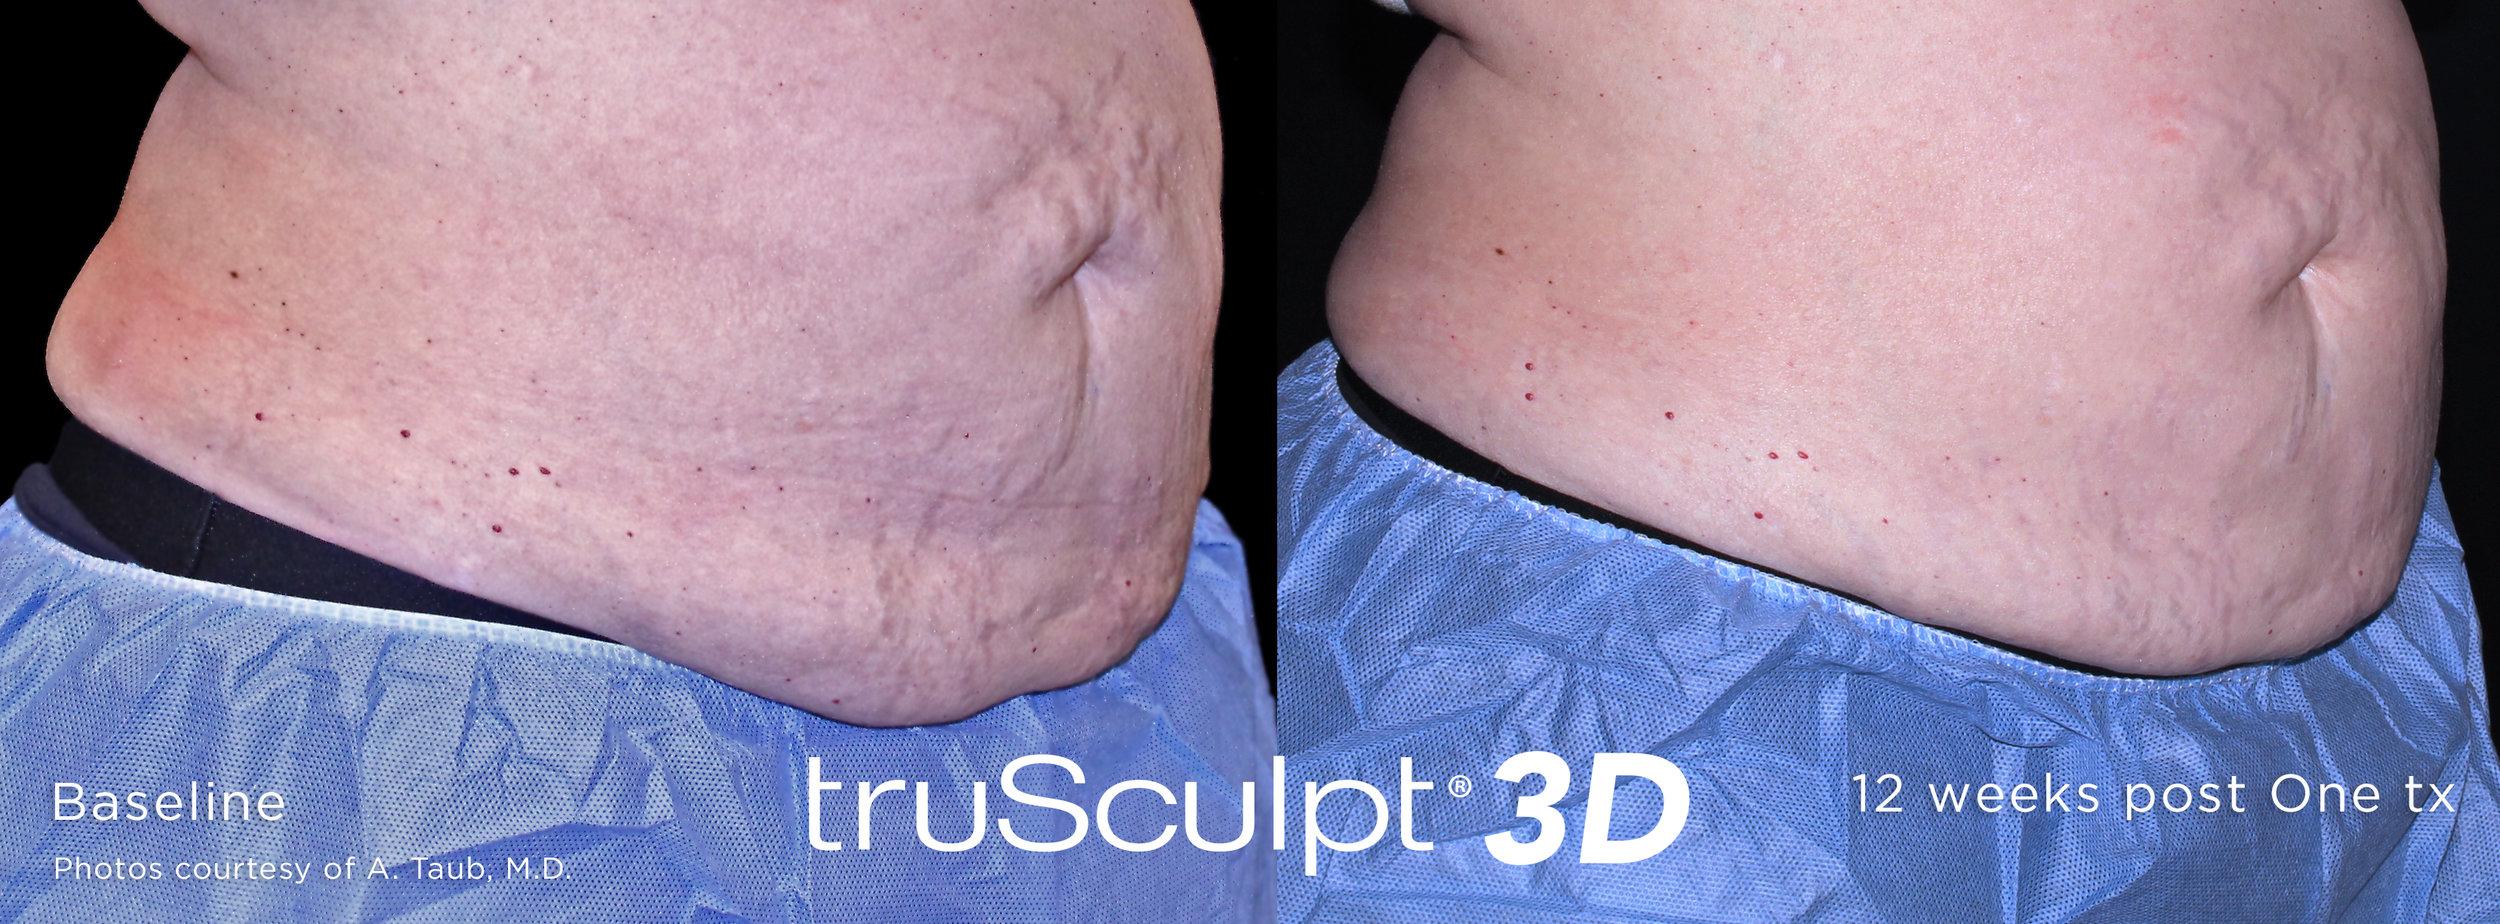 truSculpt-3D-B-A-Image-3 (2).jpg